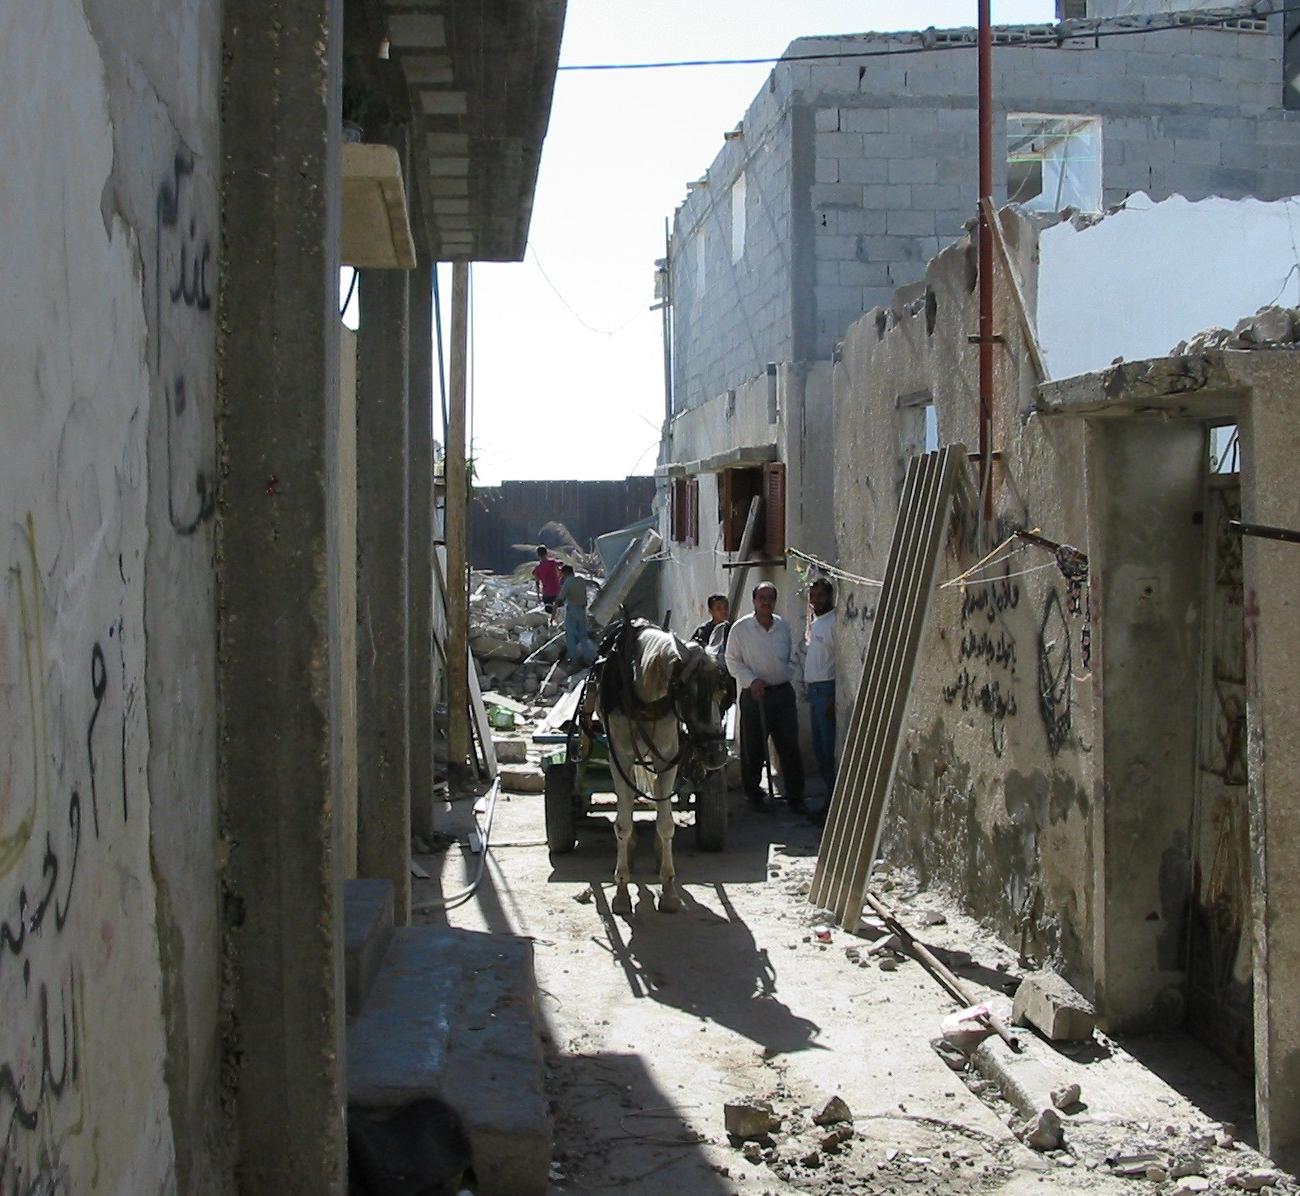 yibna.alley